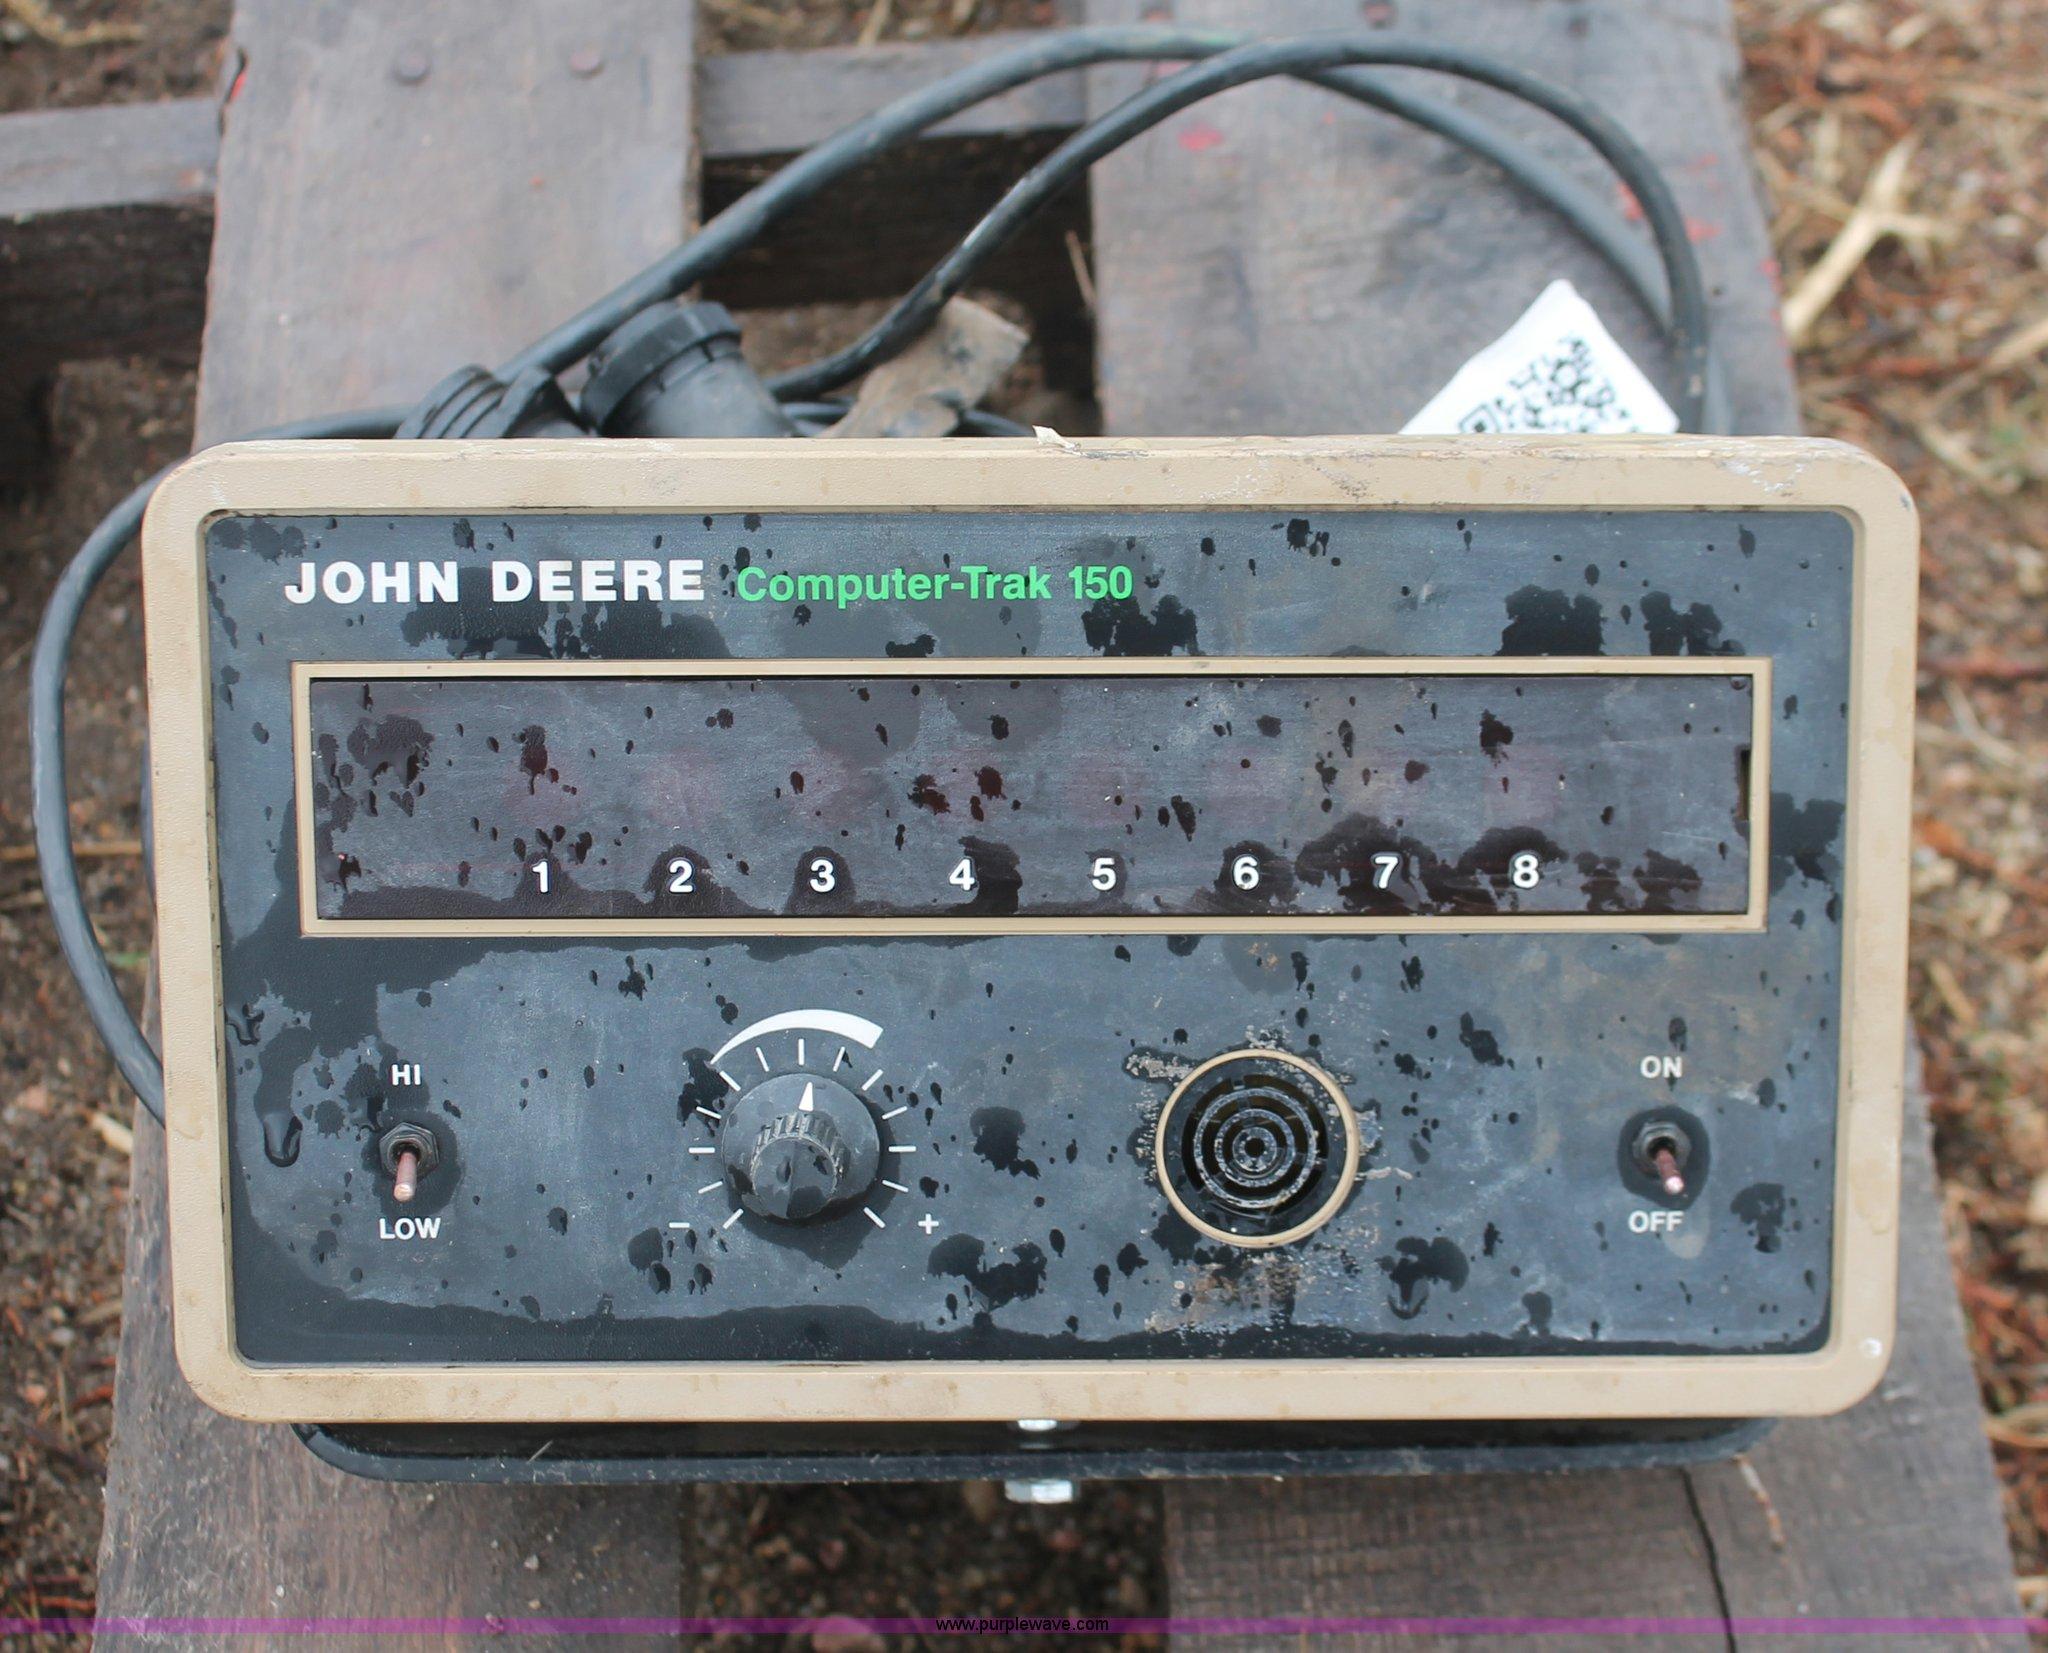 John Deere Computer Trak 150 Monitor Item I8052 Sold Se